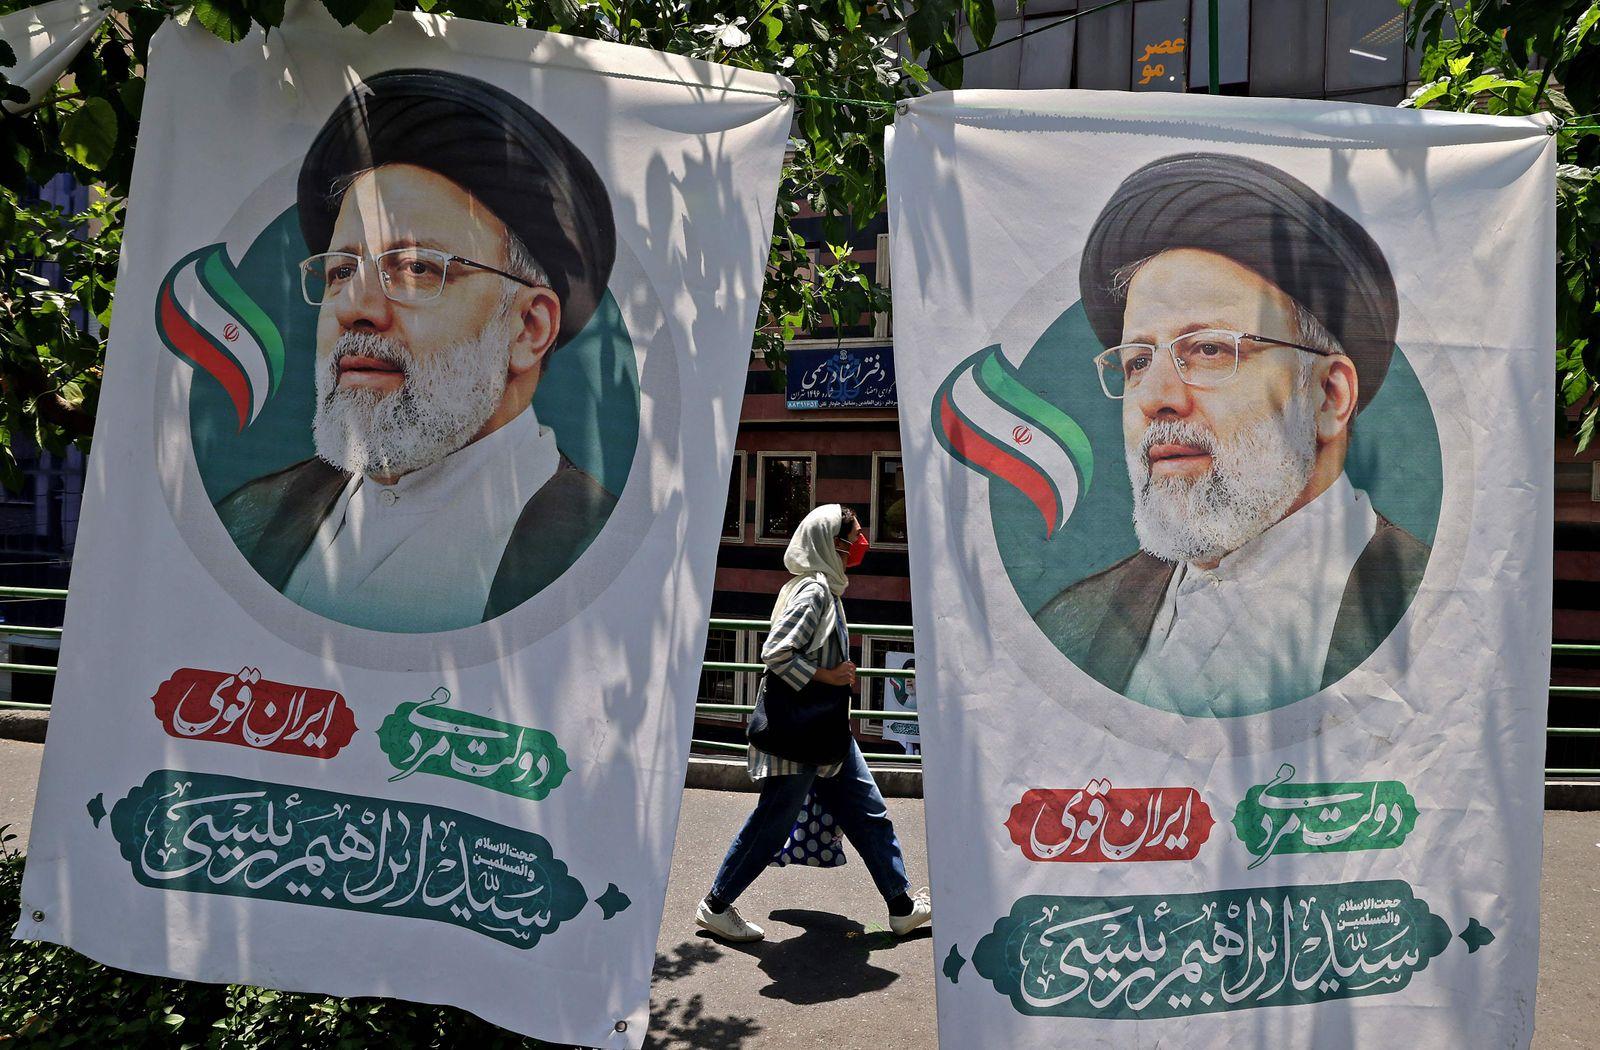 TOPSHOT-IRAN-VOTE